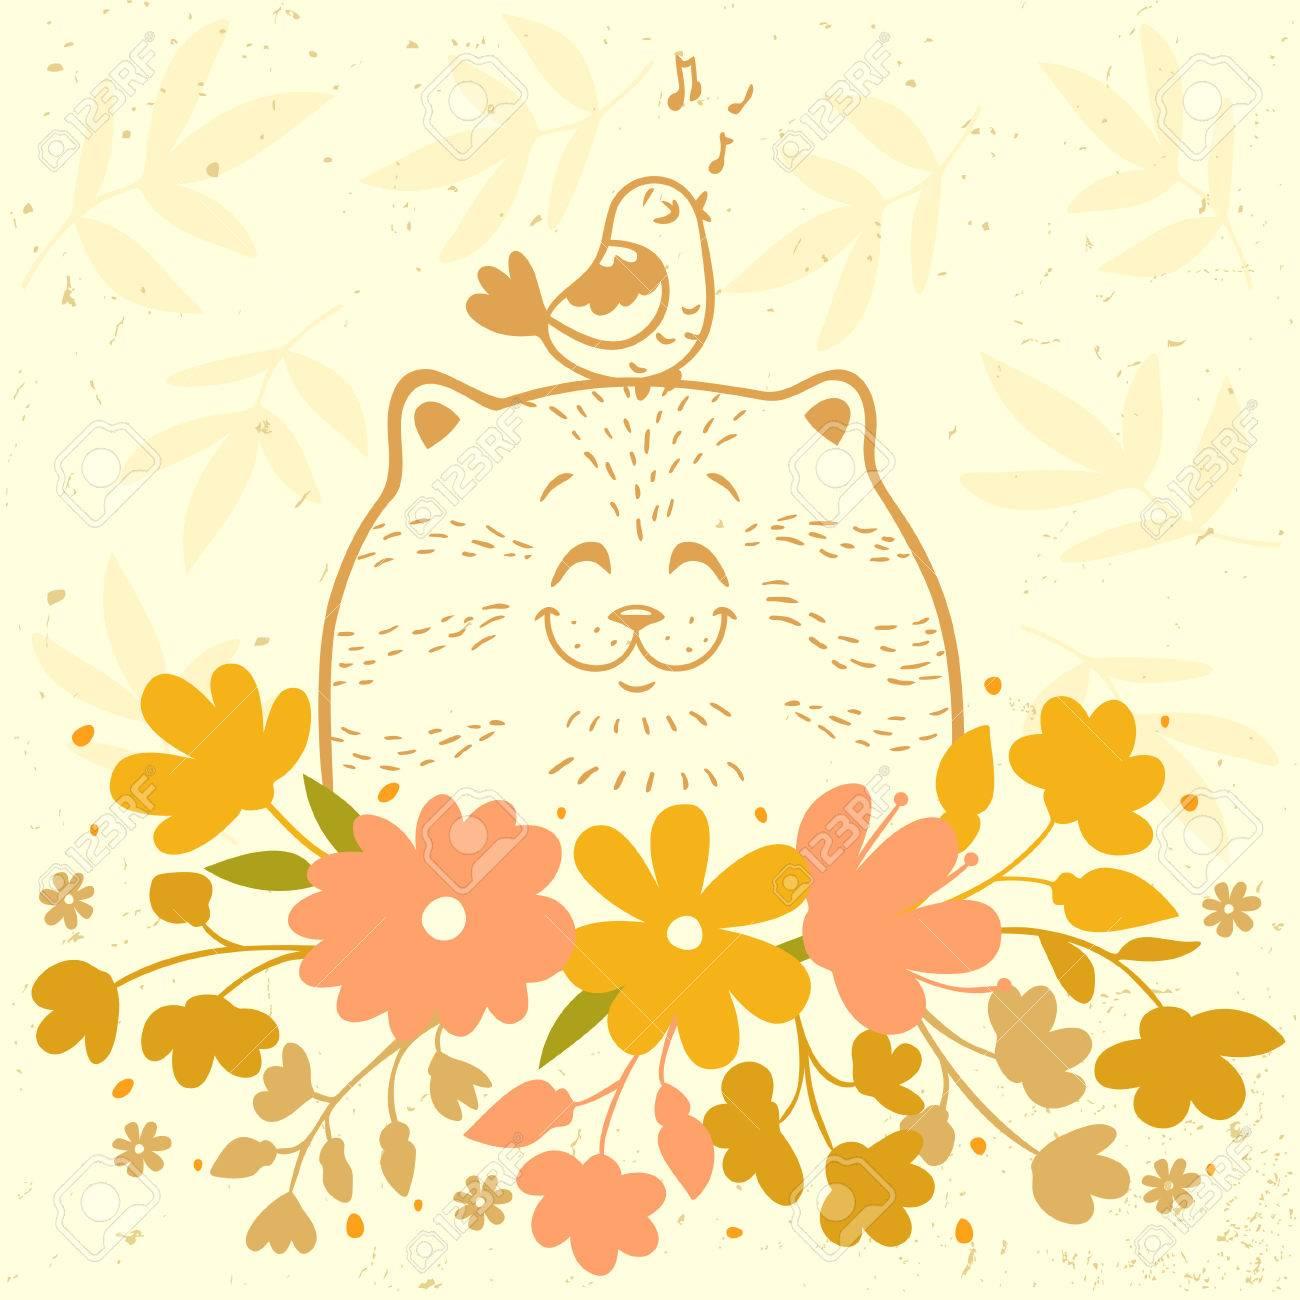 Cute and beautiful cartoon silhouette cat with a bird and flowers cute and beautiful cartoon silhouette cat with a bird and flowers stock vector 38626183 izmirmasajfo